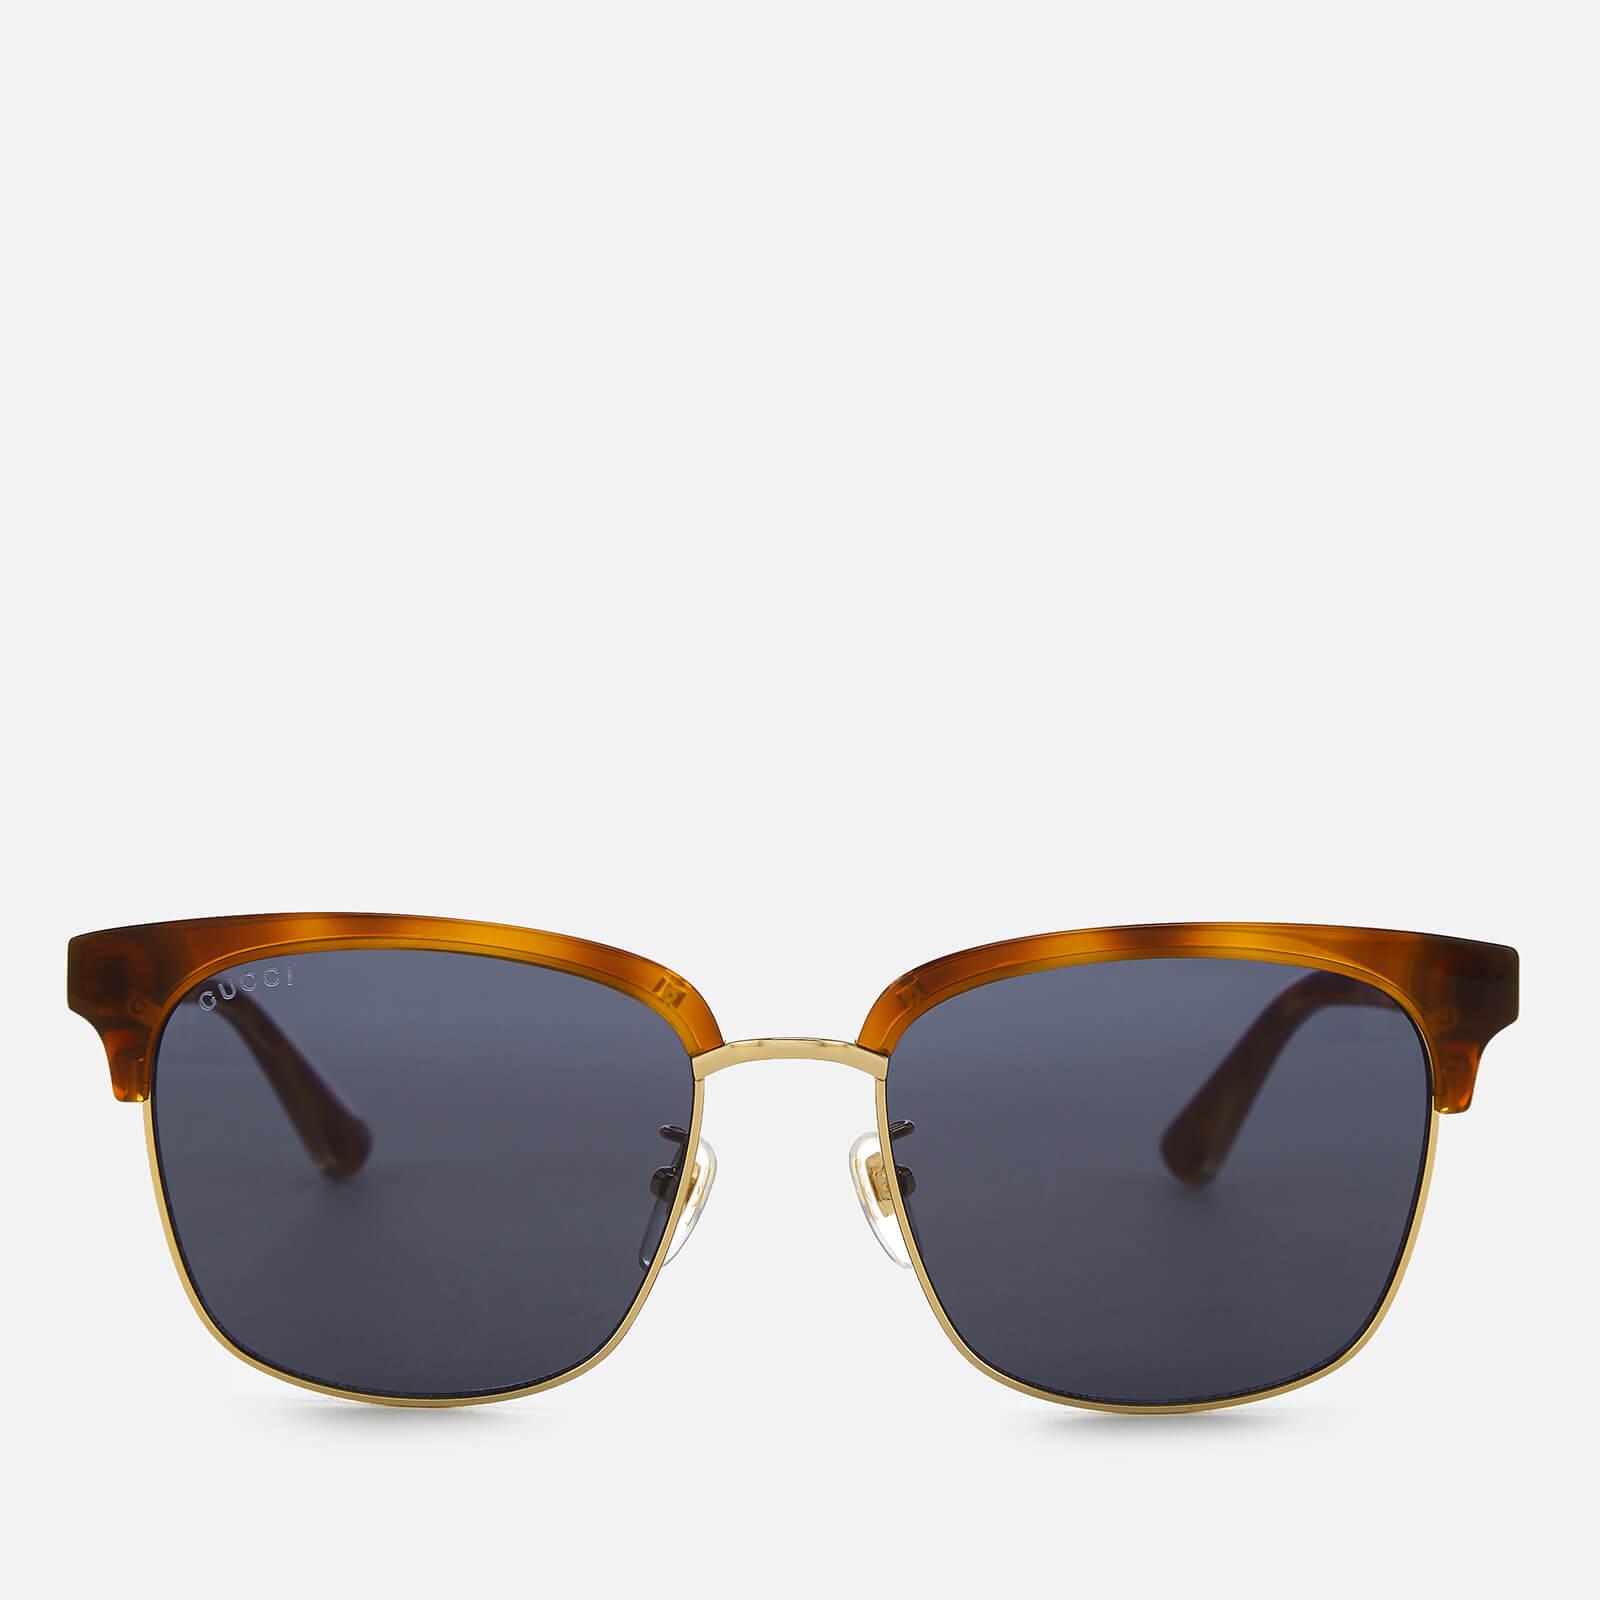 9f1c4ddf15f Gucci Men s Tortoiseshell Frame Sunglasses - Brown - Free UK Delivery over  £50